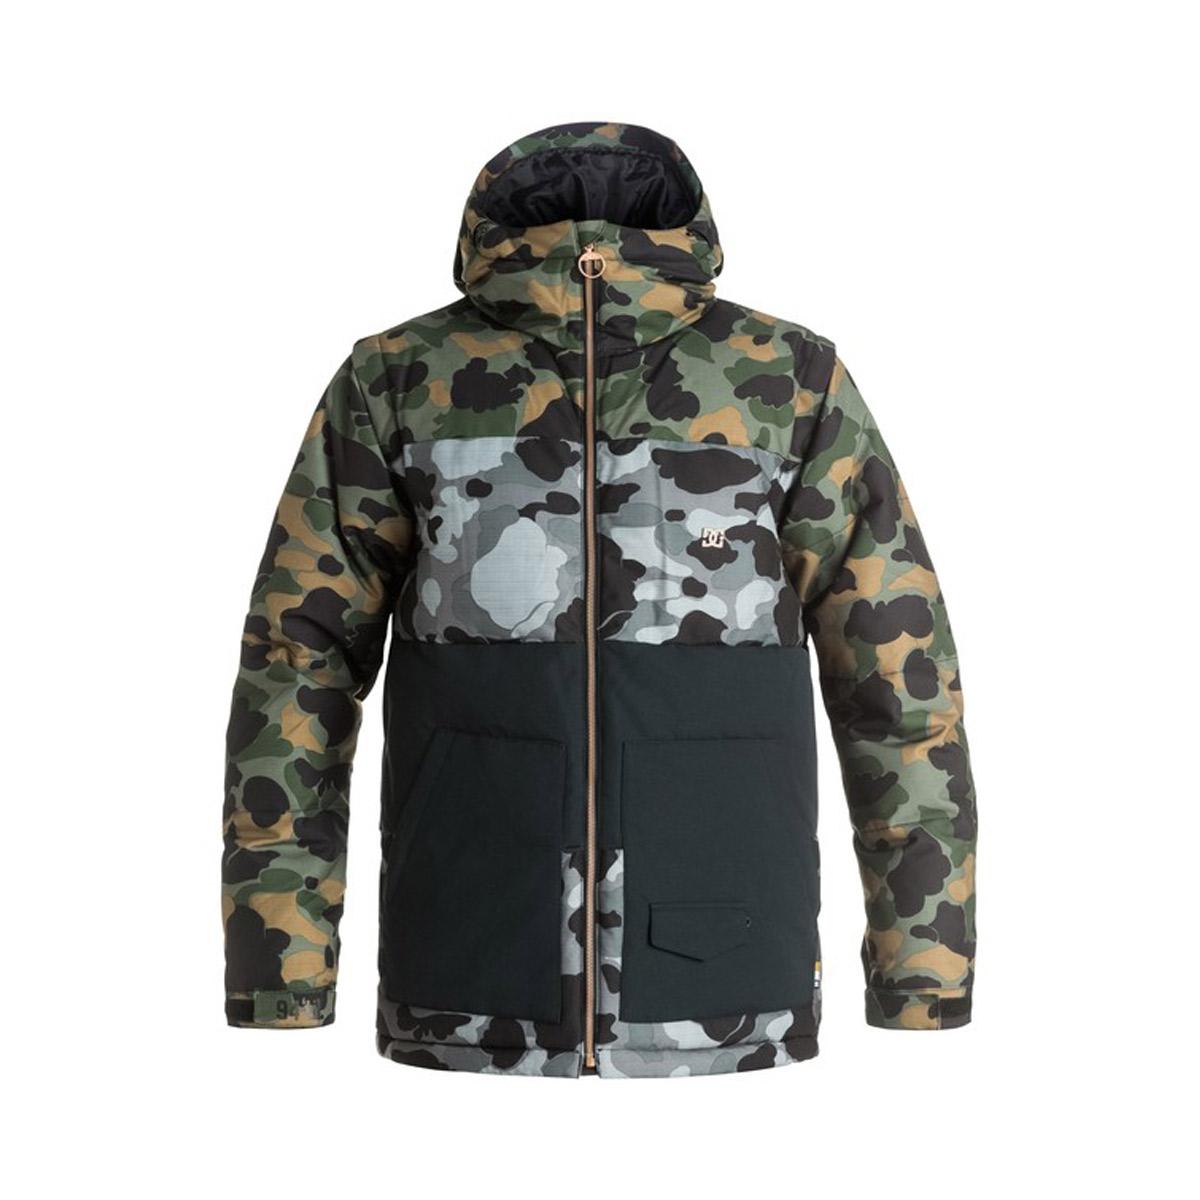 Куртки сноубордические DC Downhill Camouflage Lodge men 2016/2017